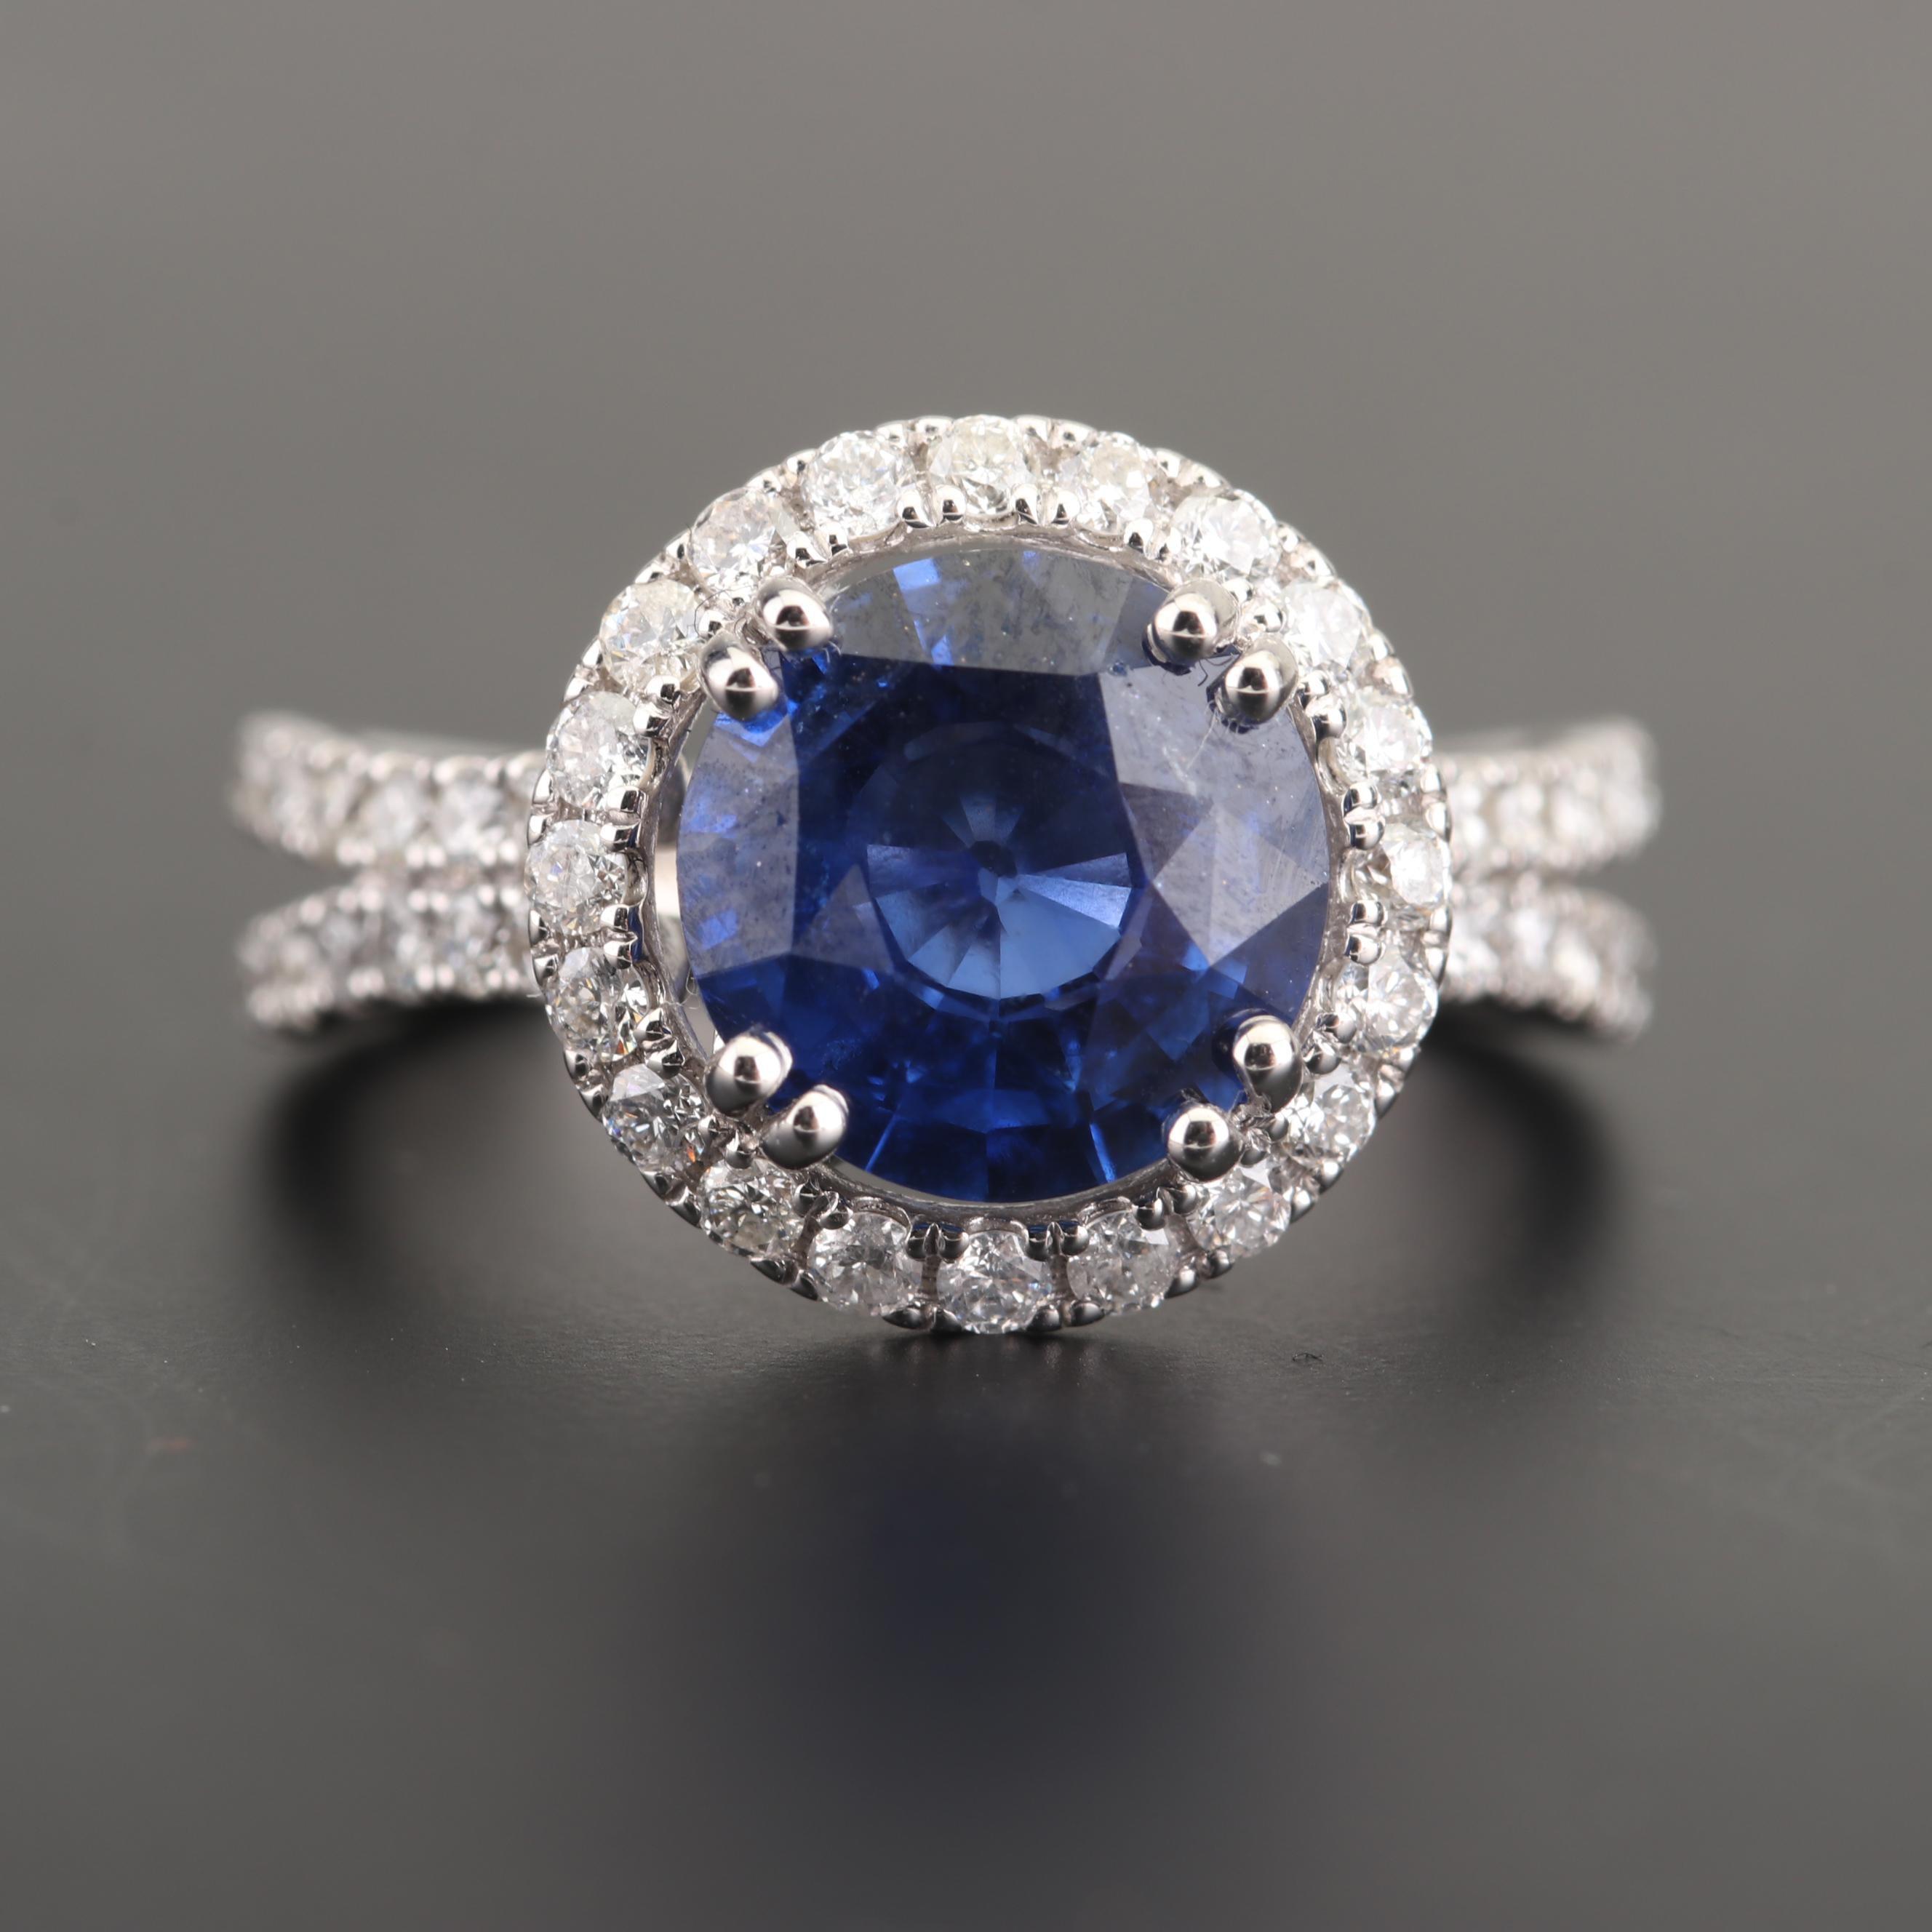 14K White Gold 2.95 CT Sri Lankan Sapphire and 1.27 CTW Diamond Ring with GIA